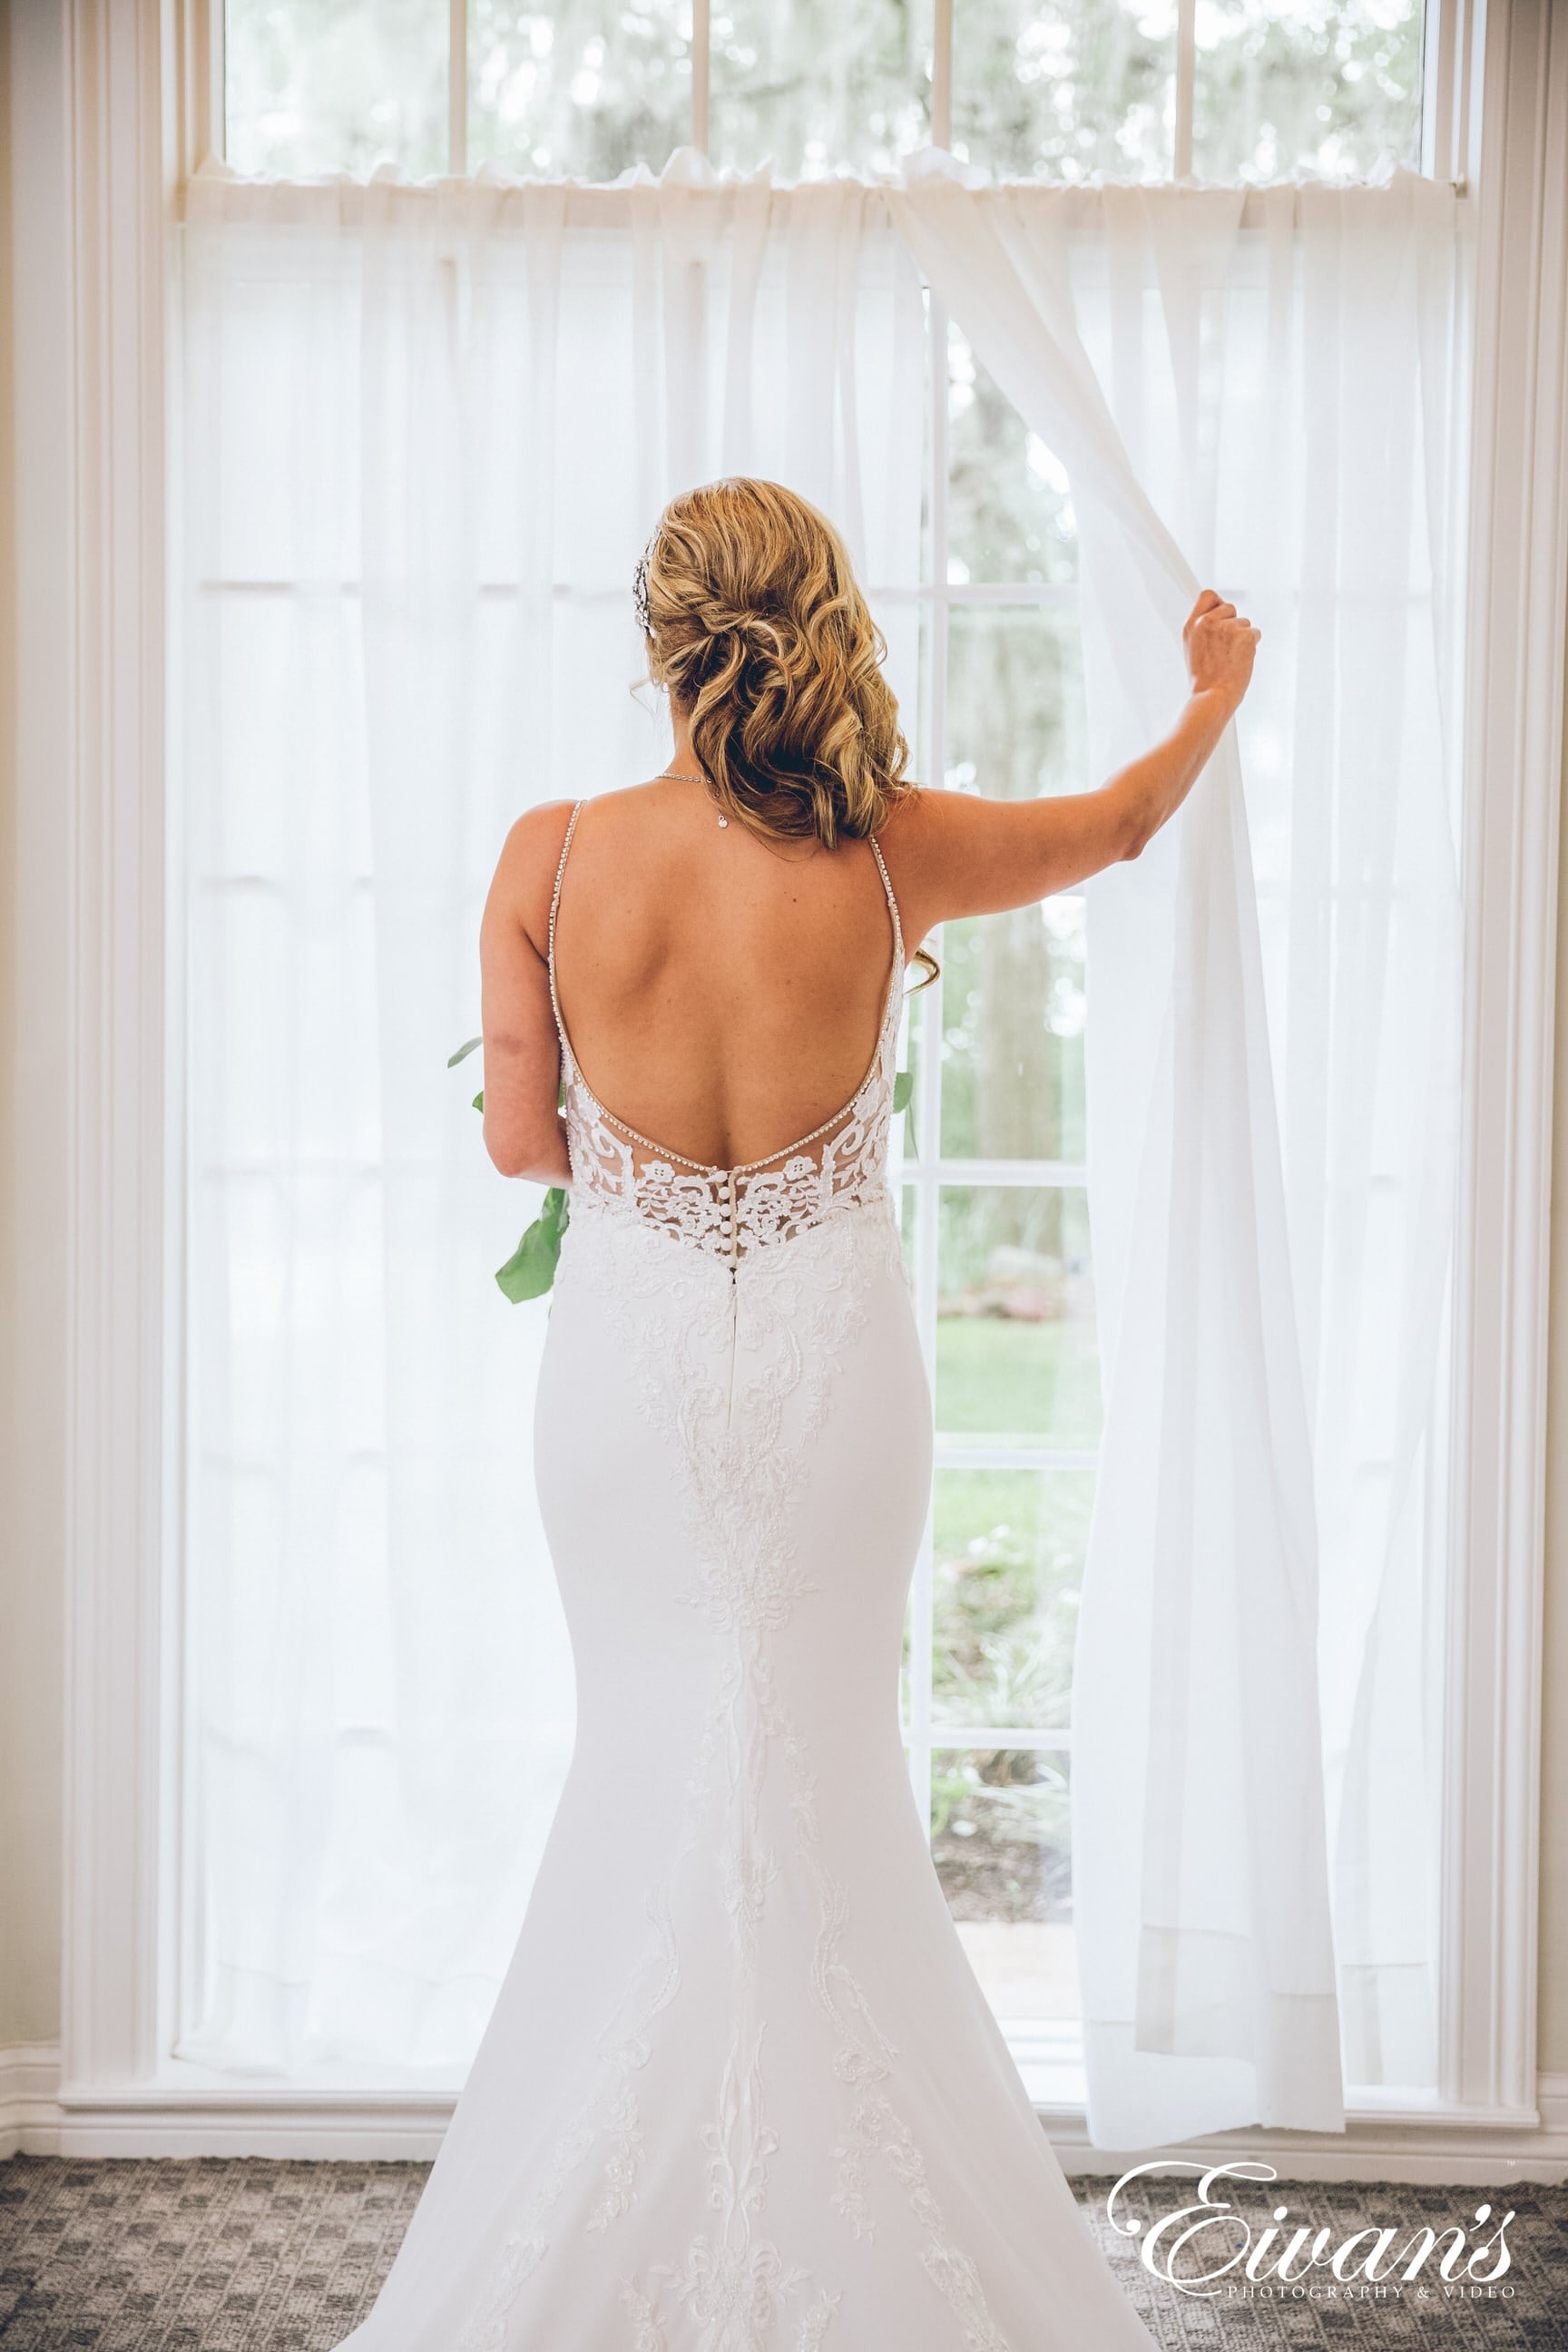 woman in white floral spaghetti strap dress standing near white window curtain